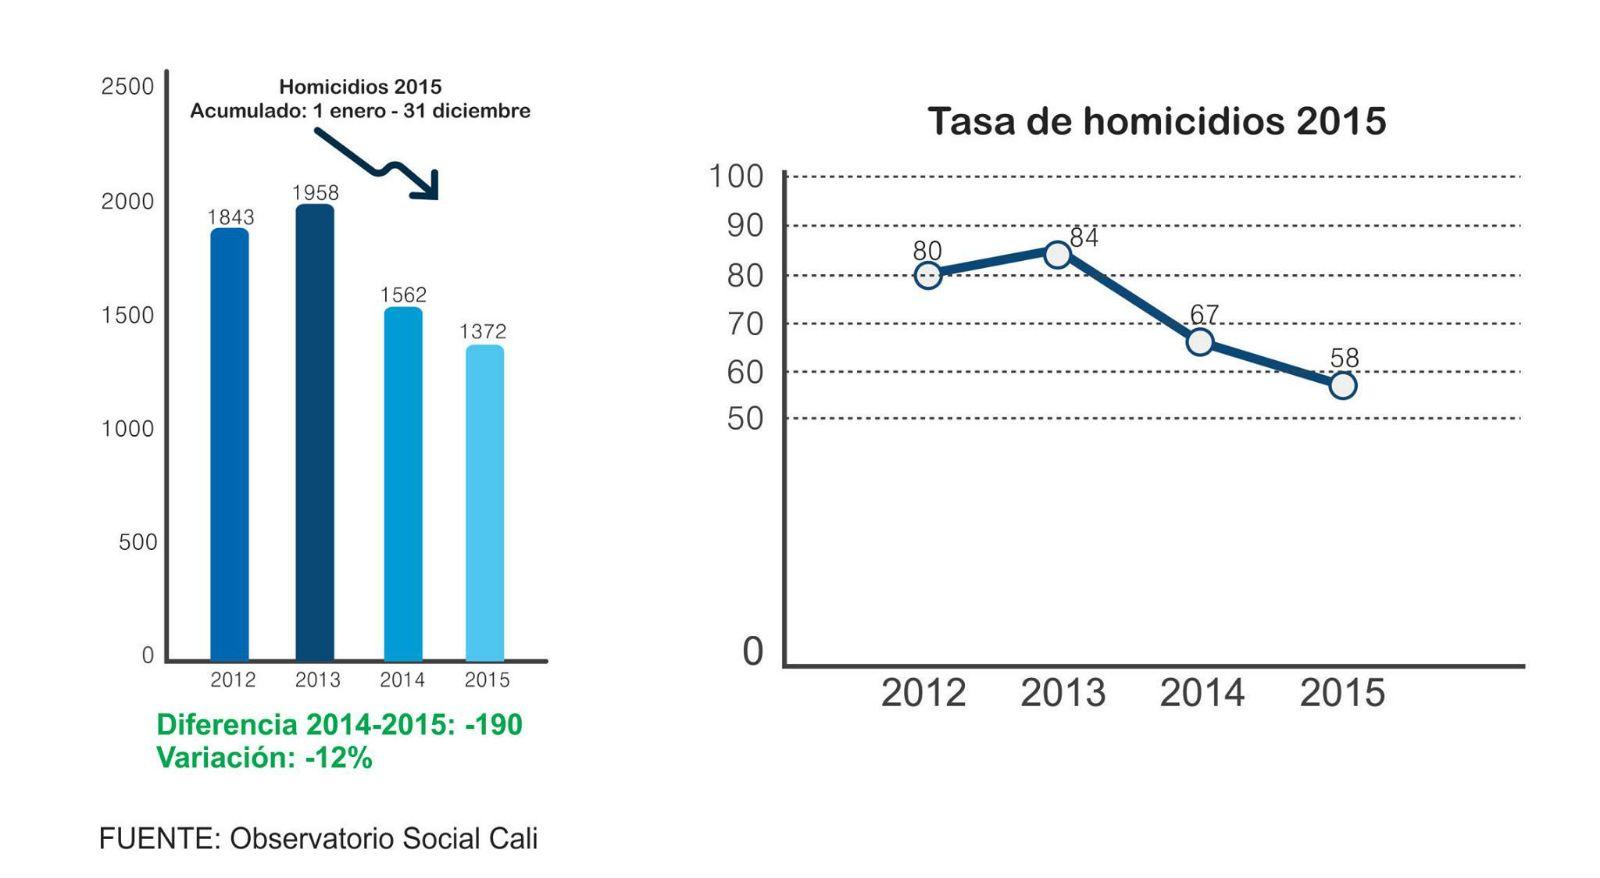 Tasa homicidios Cali 2015